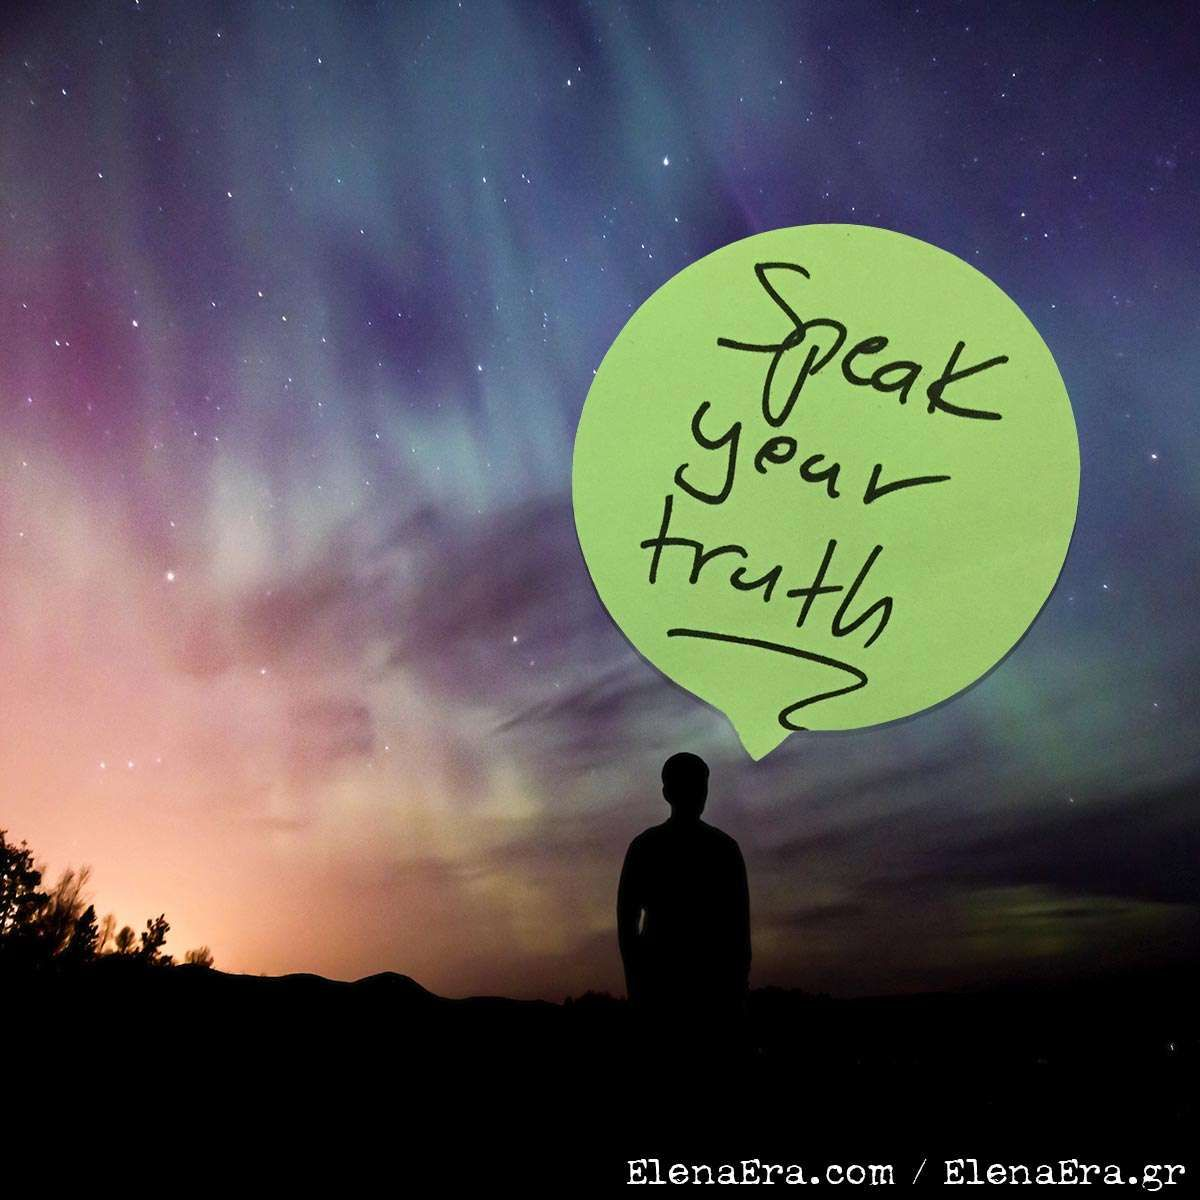 Spiritual Quotes About Love And Life Awakening Quotes Life Quotes Spiritual Quotes Positive Thinking